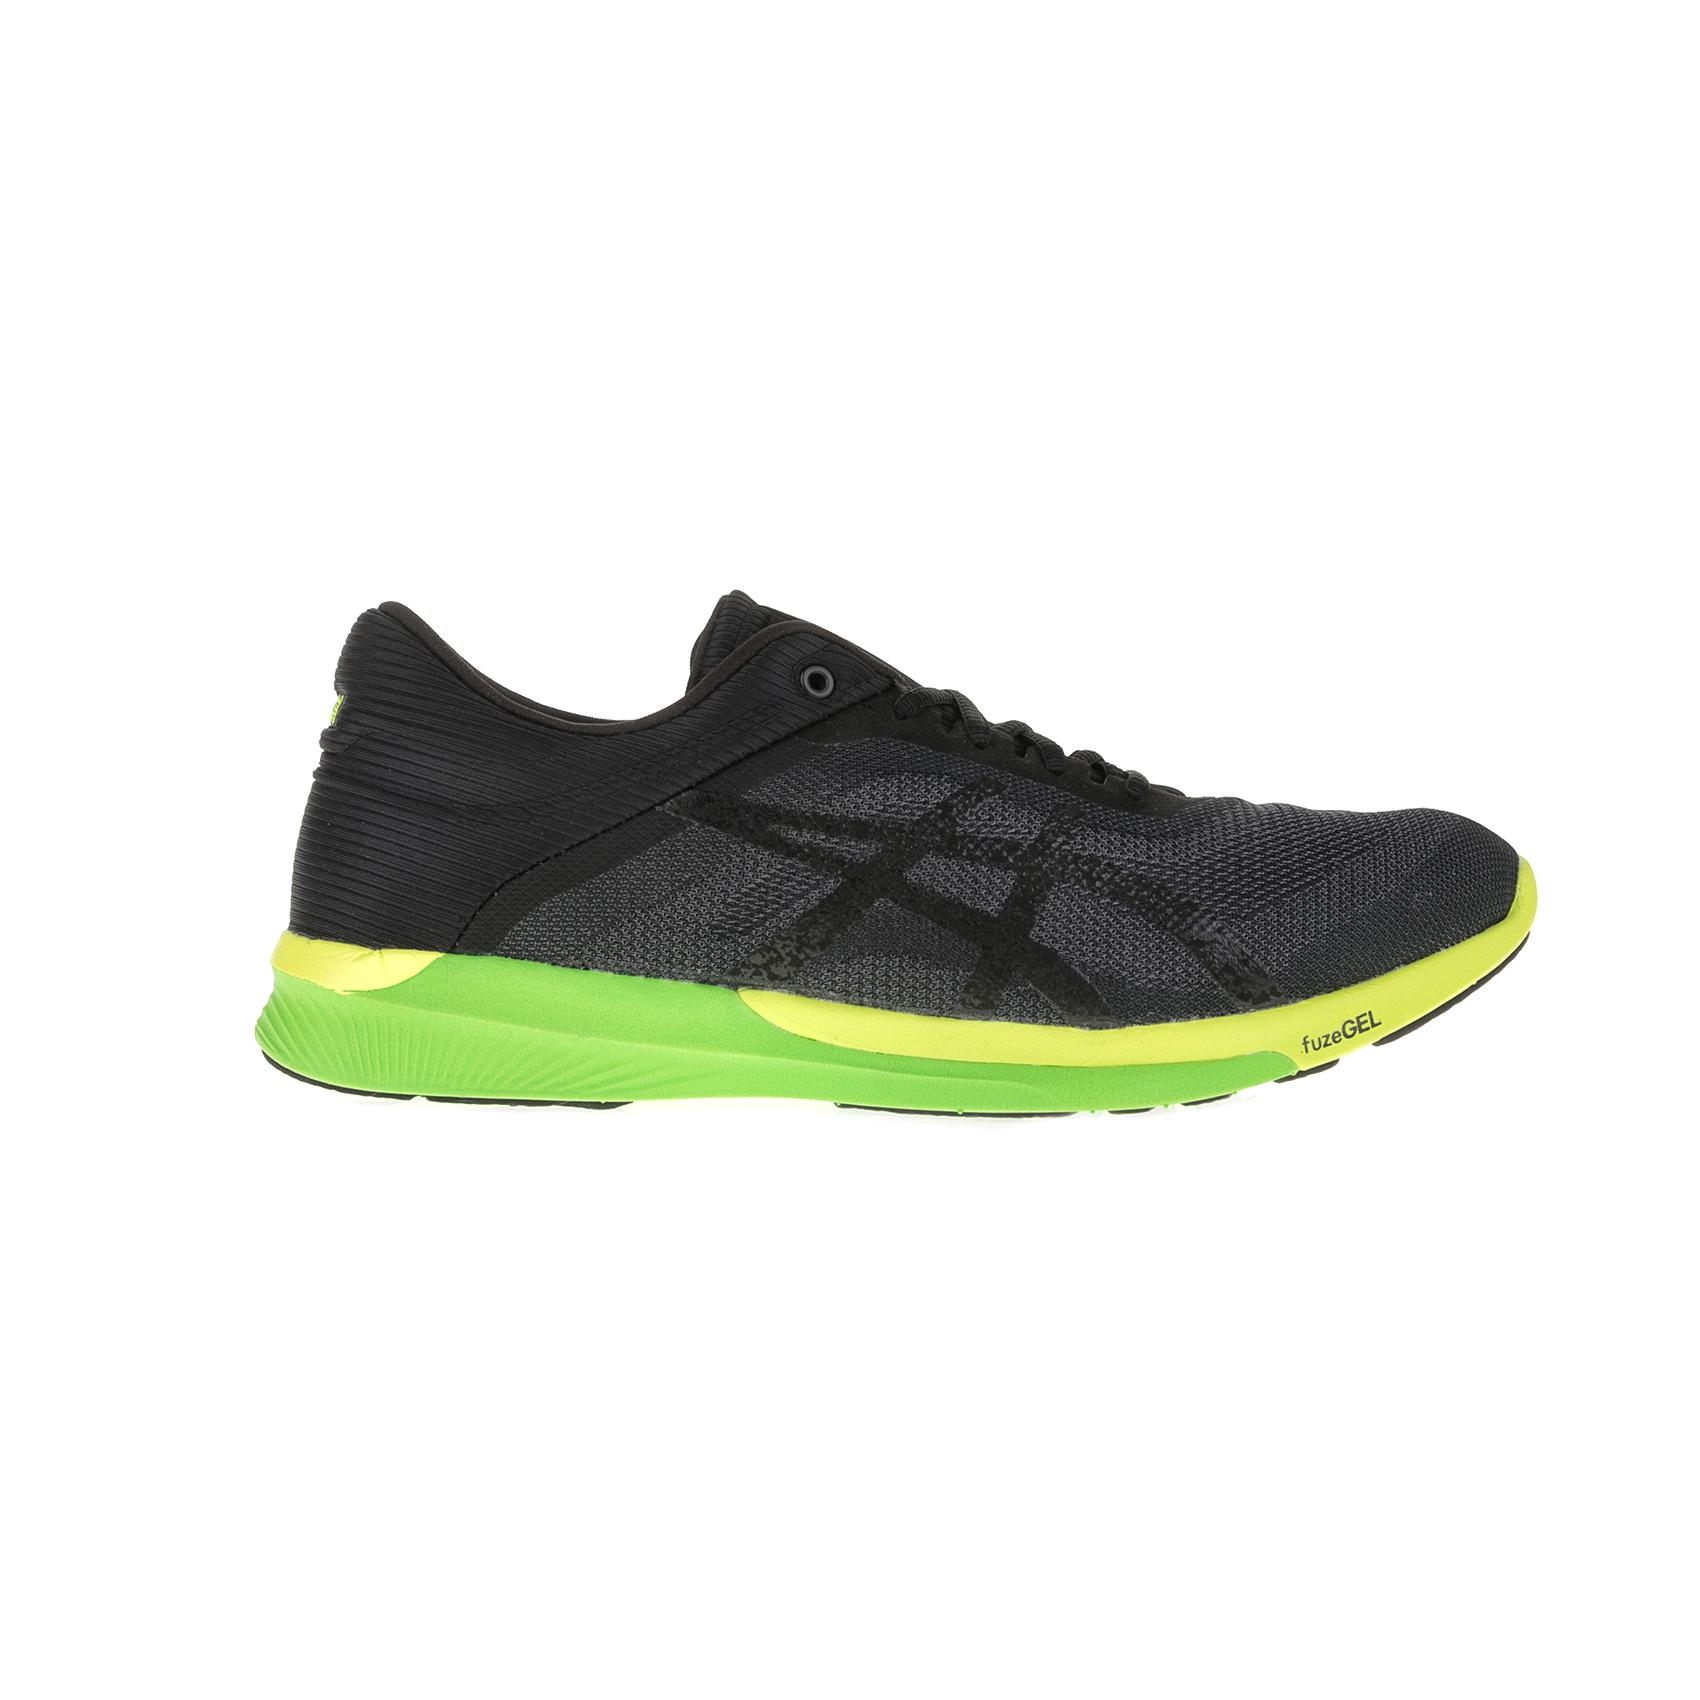 ASICS - Ανδρικά παπούτσια ASICS fuzeX Rush μαύρα-ανθρακί ανδρικά παπούτσια αθλητικά running